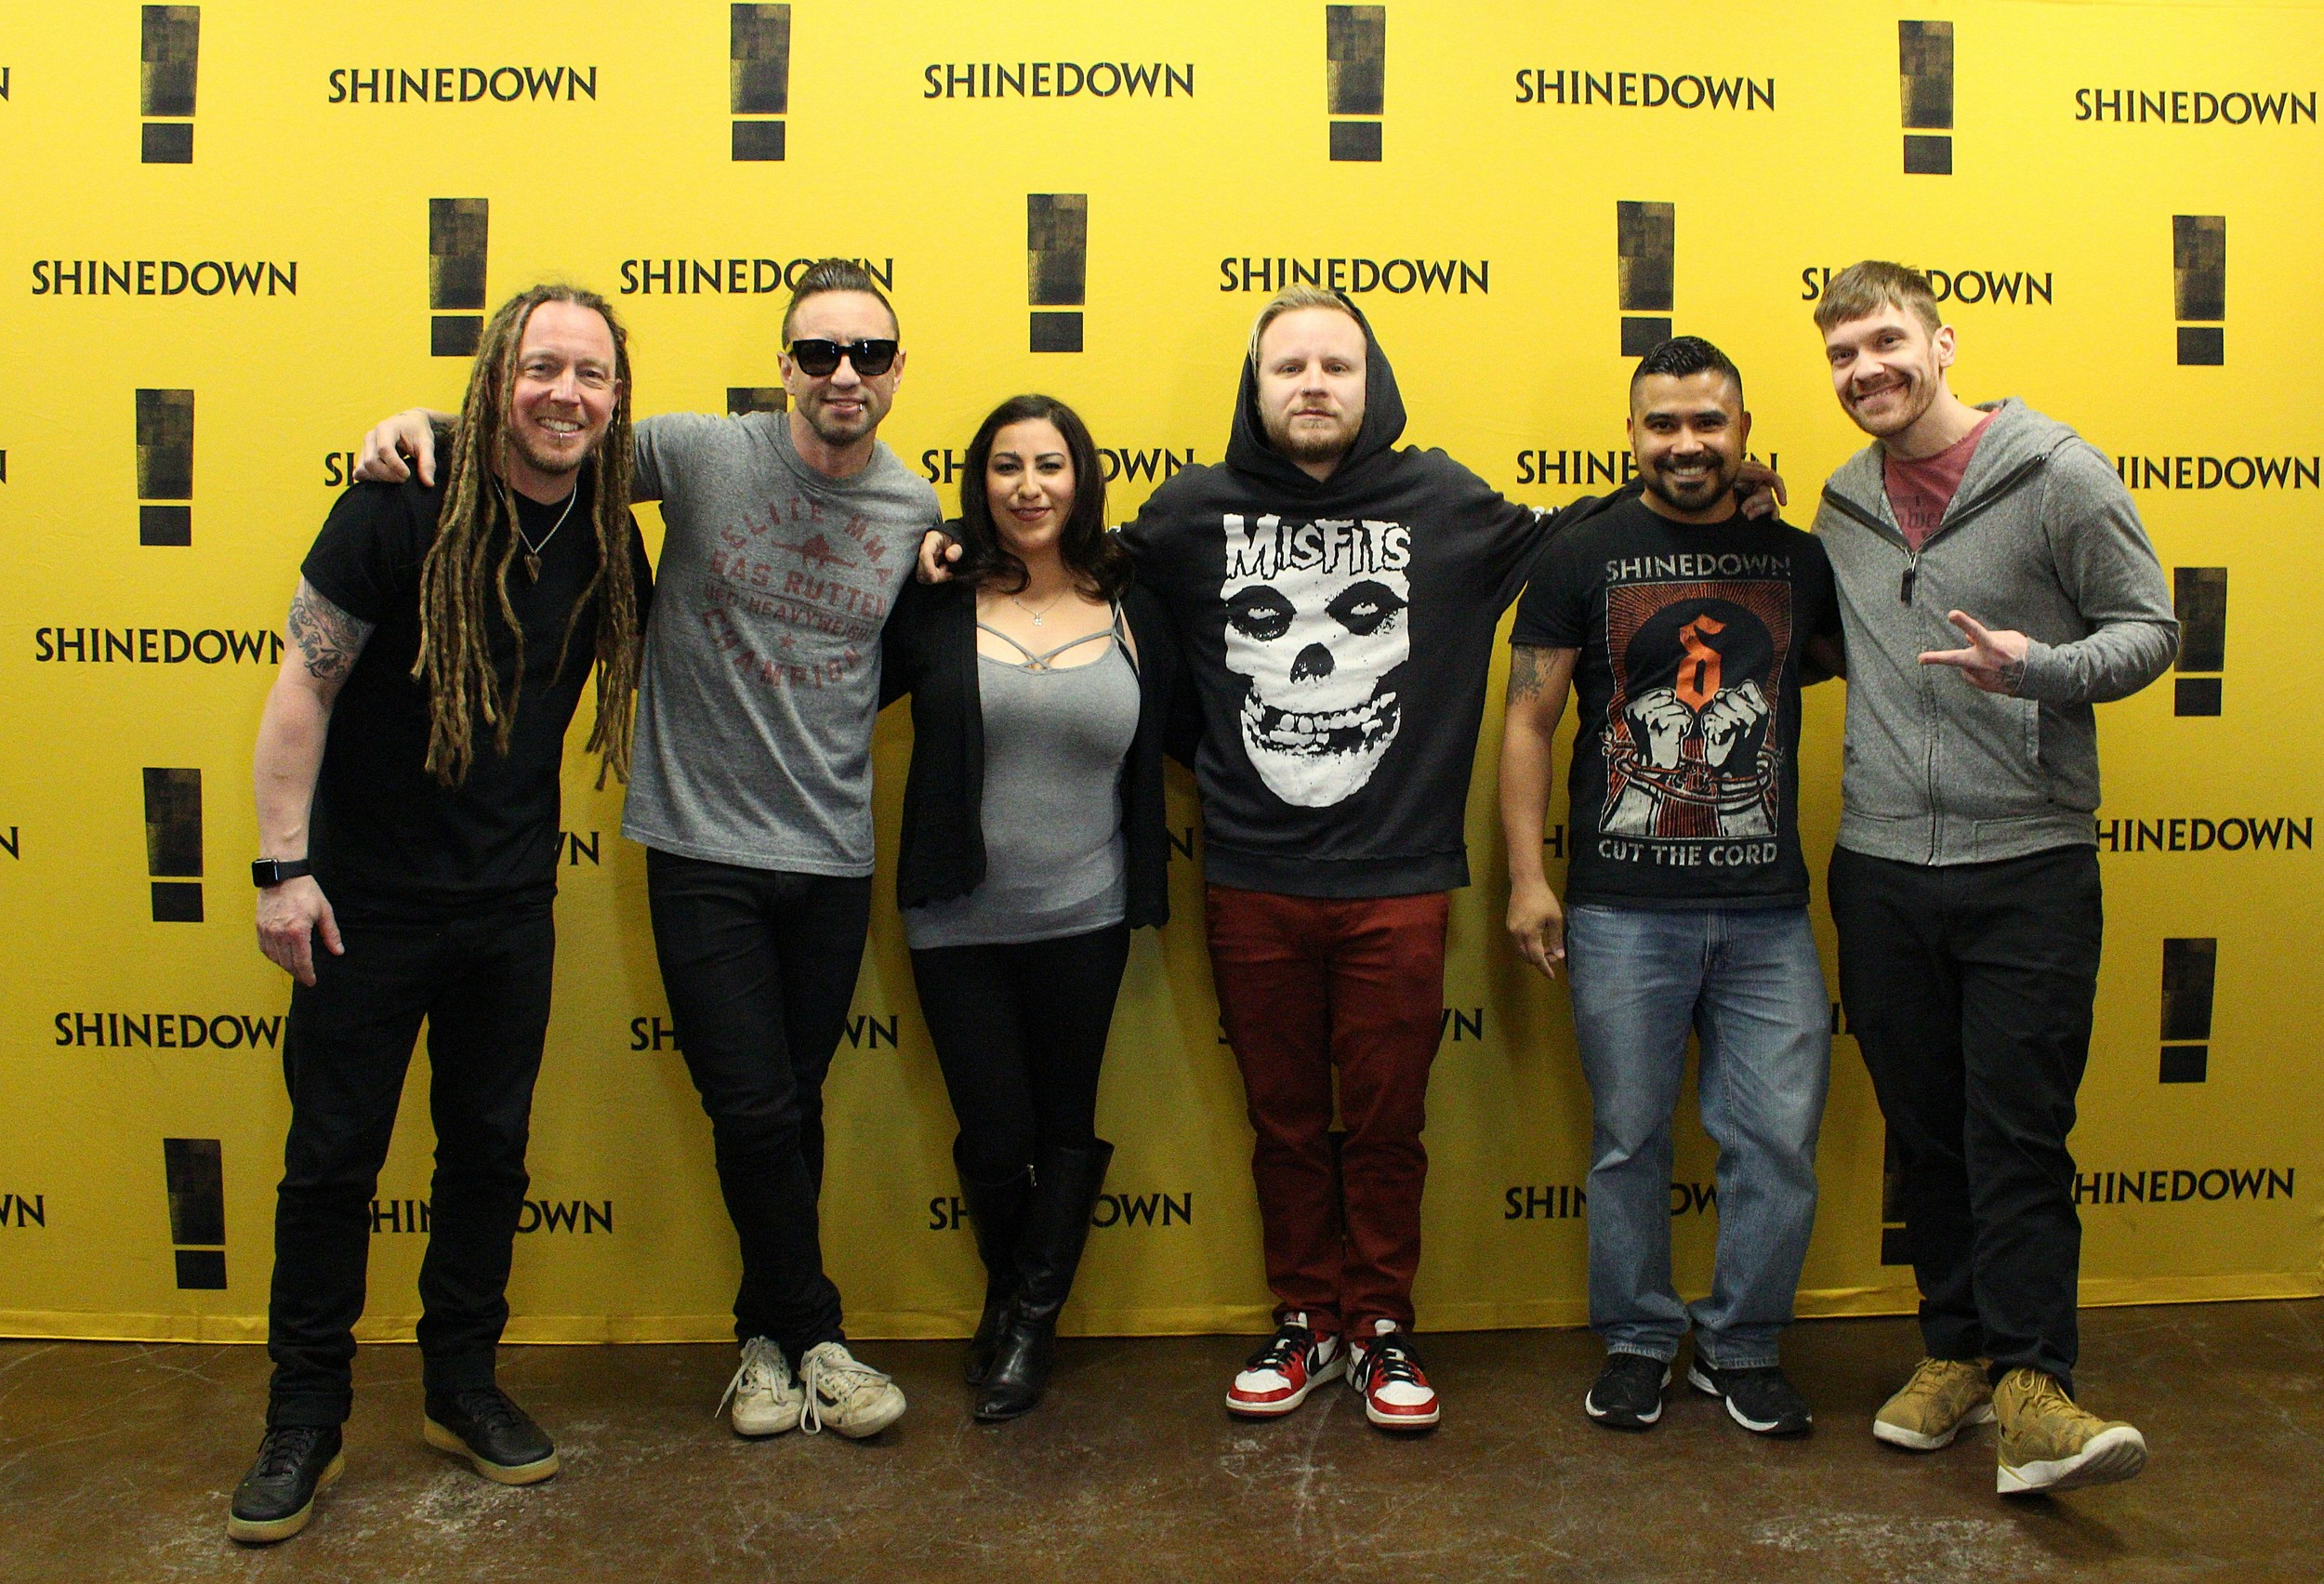 Shinedown Meet Greet Photos